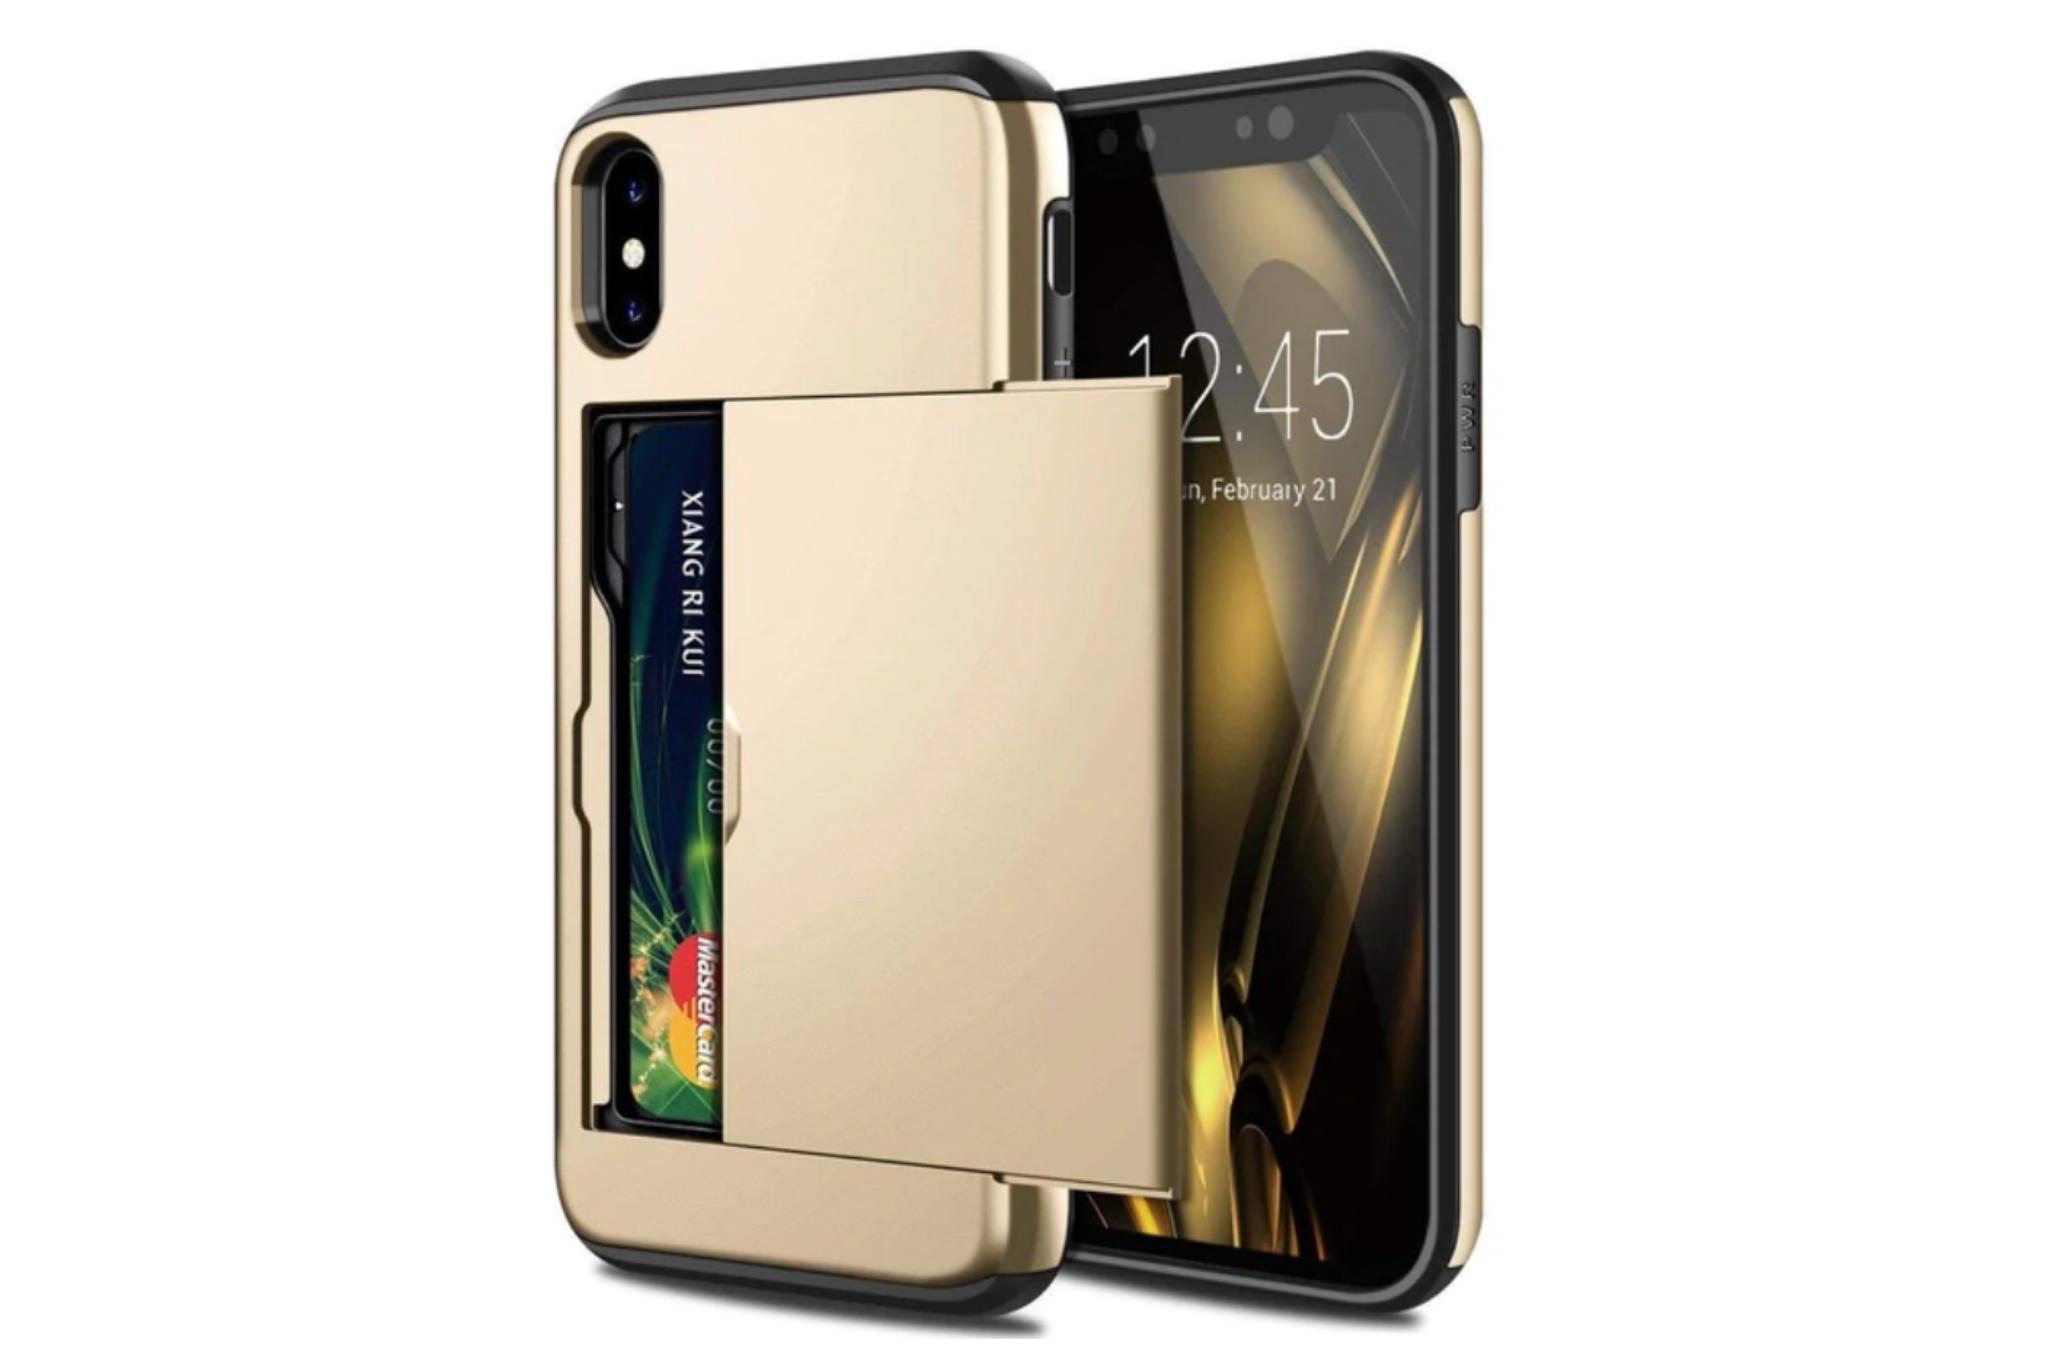 Smartphonehoesje iPhone 7 / 8 | Pasjesschuif gold